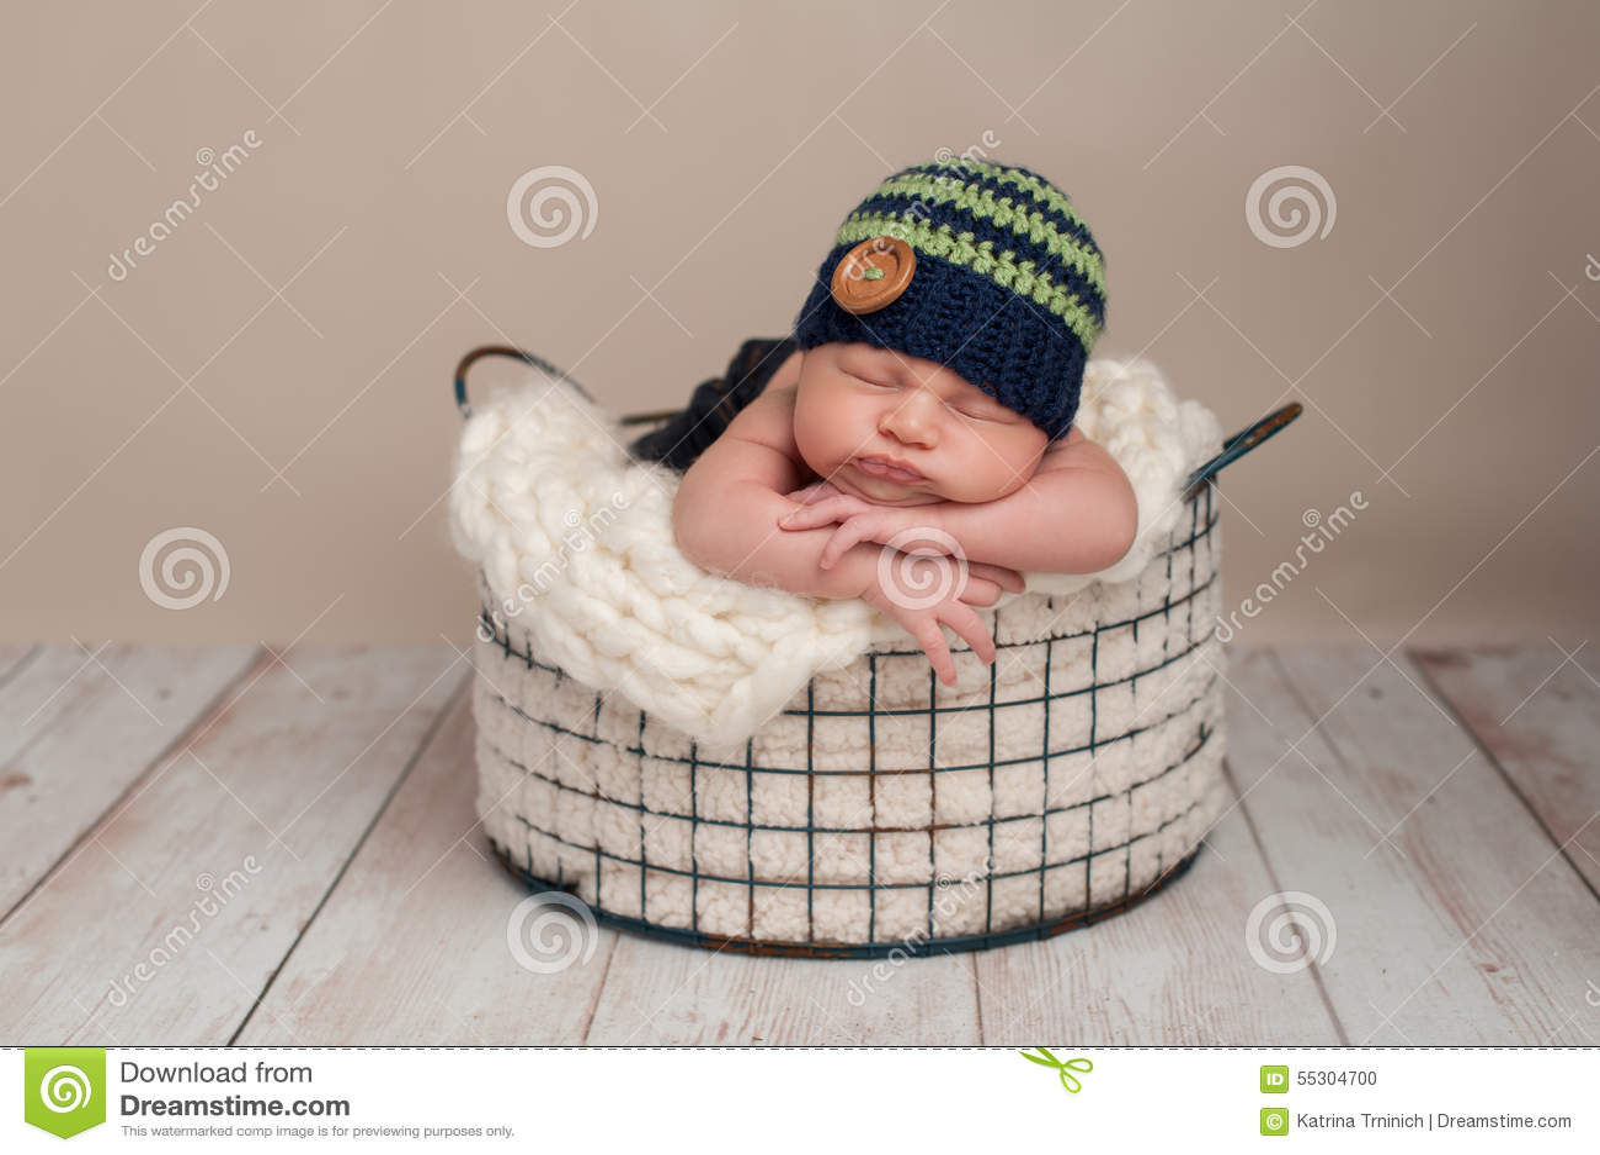 ecc9fce86 Newborn Baby Boy Wearing A Beanie Cap Stock Photo - Image of button ...